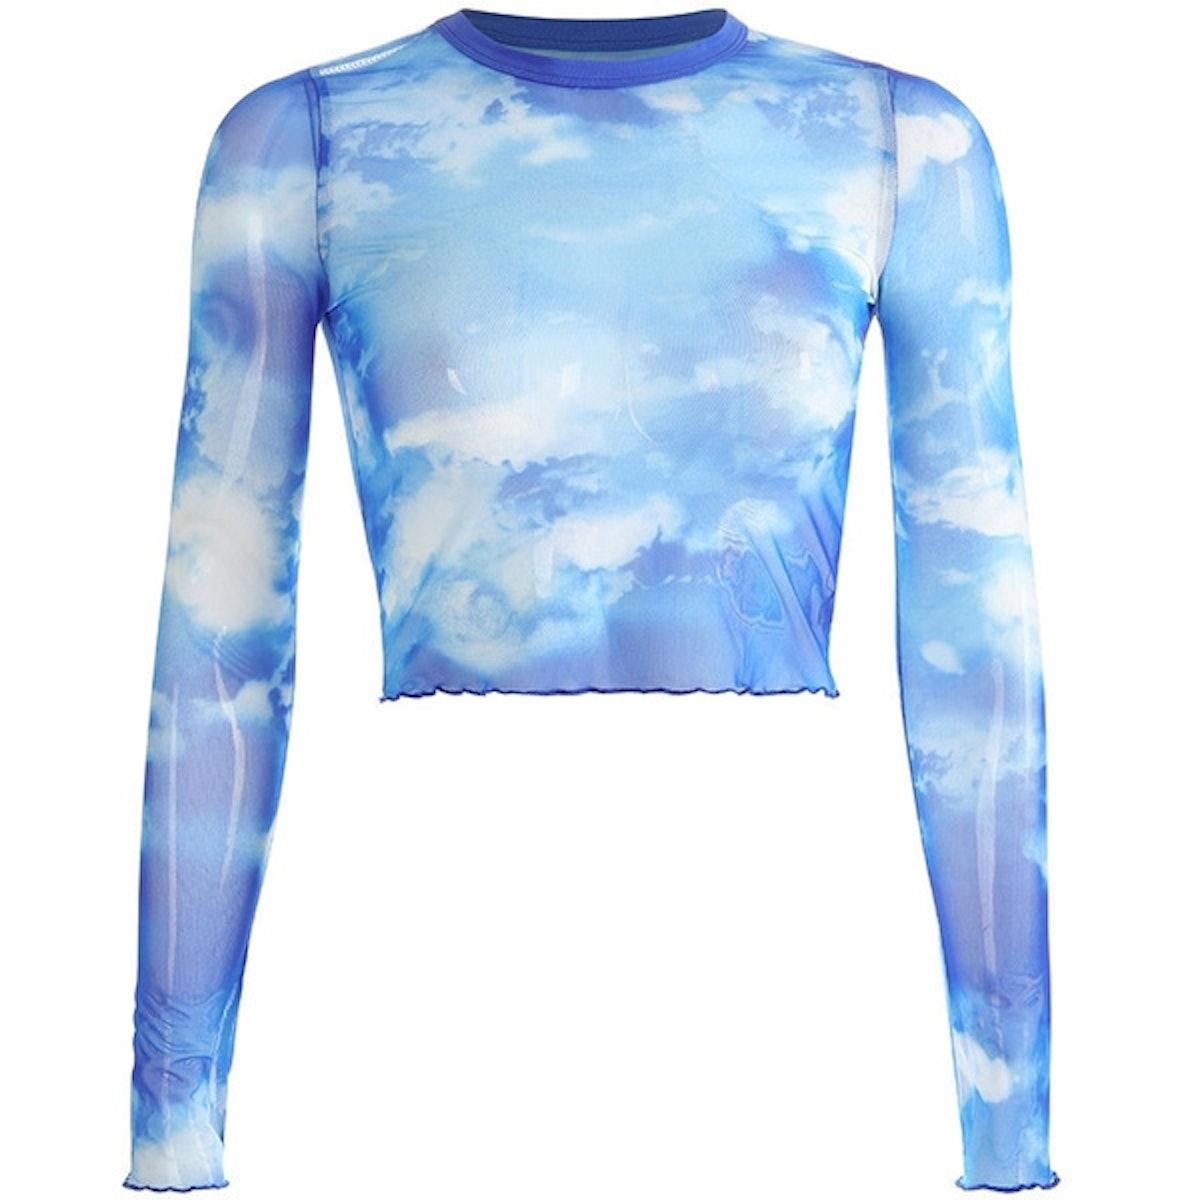 Wish Vintage Ins Hot Blue Sky White Clouds Pattern Printing Slim Long Sleeve Mesh Women Crop Top Short T Shirts